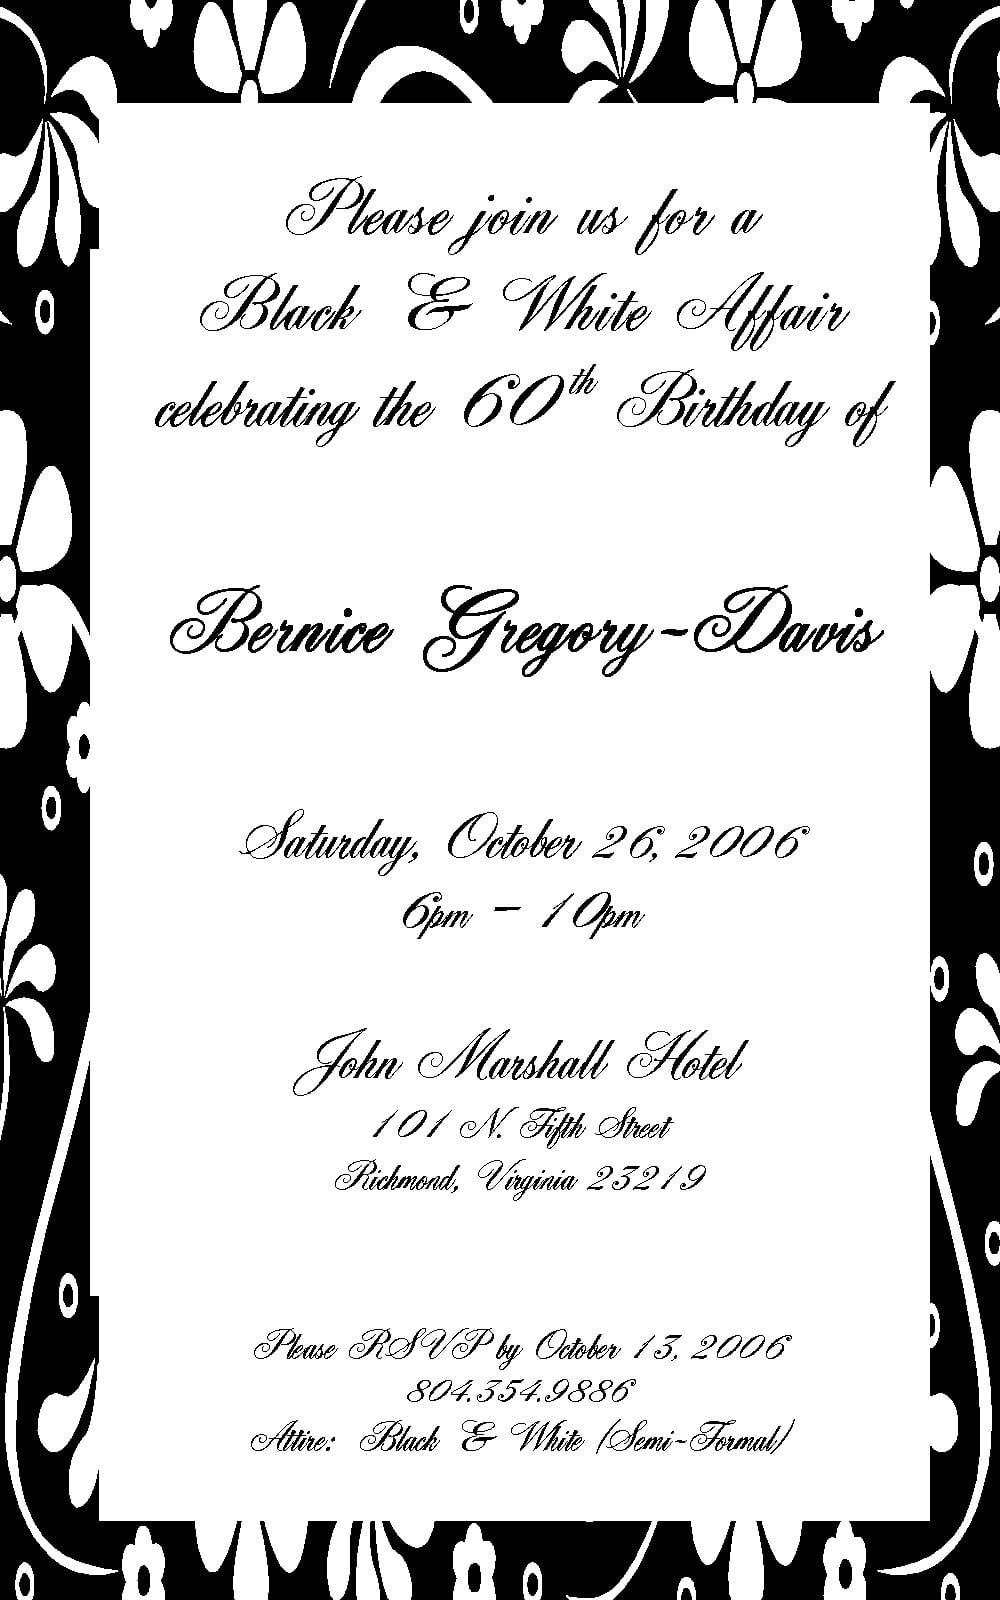 Sample Birthday Invitation Email